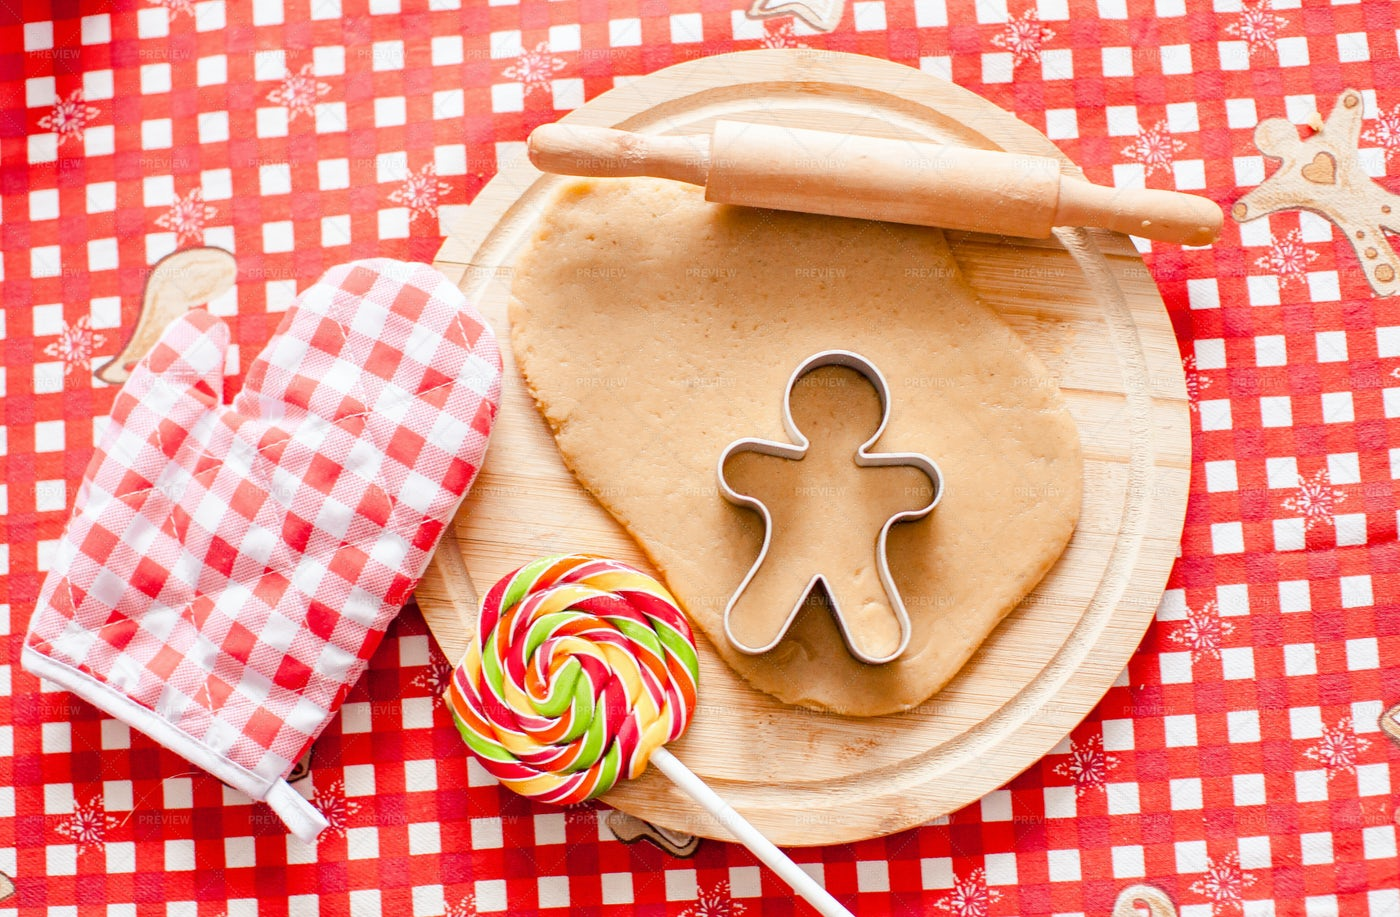 Gingerbread Ingredients: Stock Photos